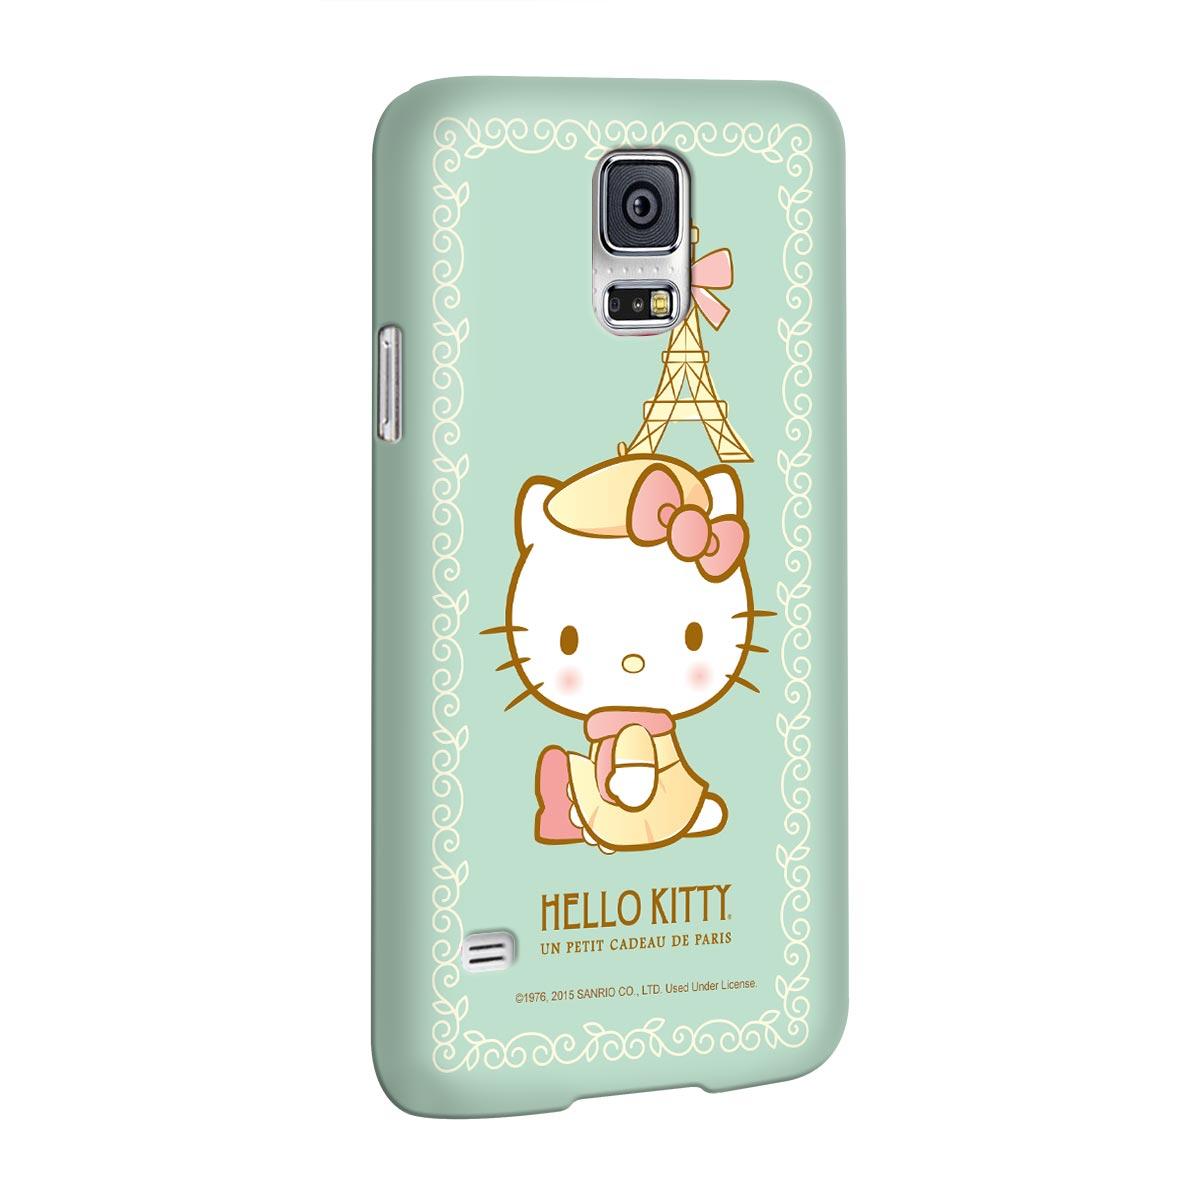 Capa para Samsung Galaxy S5 Hello Kitty Un Petit Cadeau